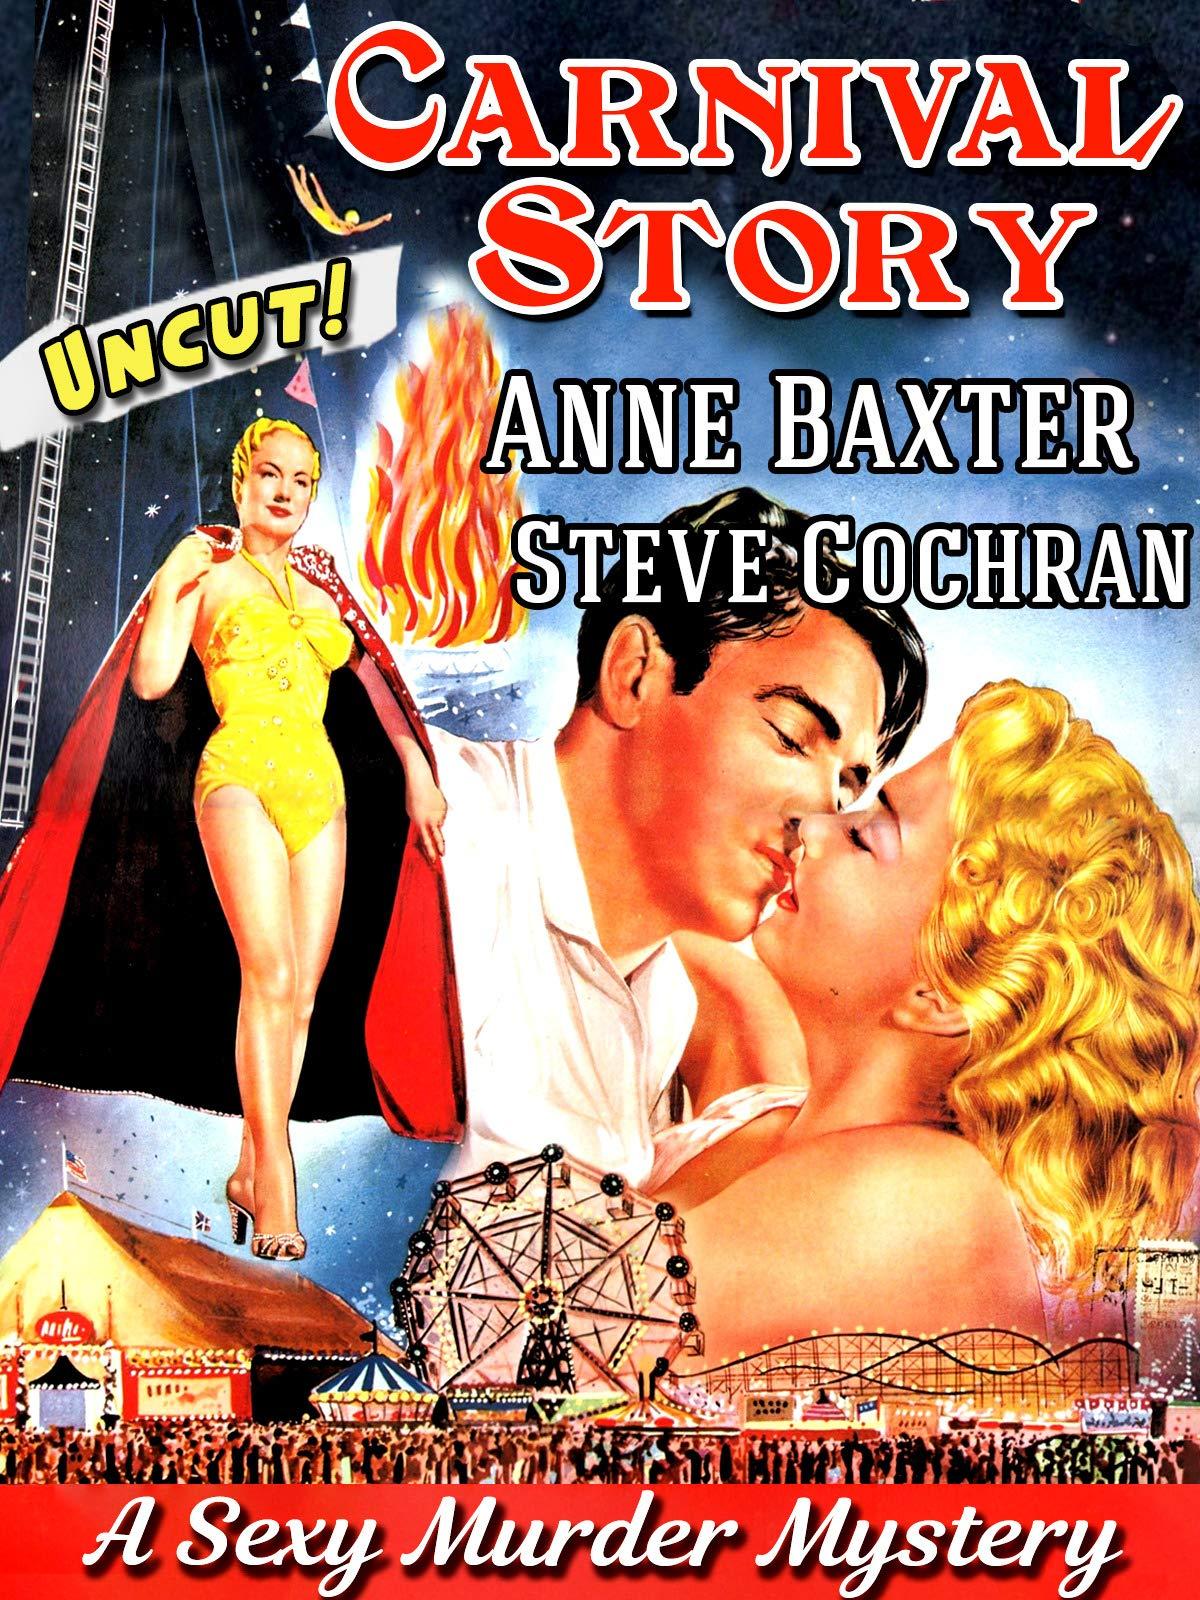 Carnival Story - Anne Baxter, Steve Cochran, A Sexy Murder Mystery, Uncut! on Amazon Prime Video UK